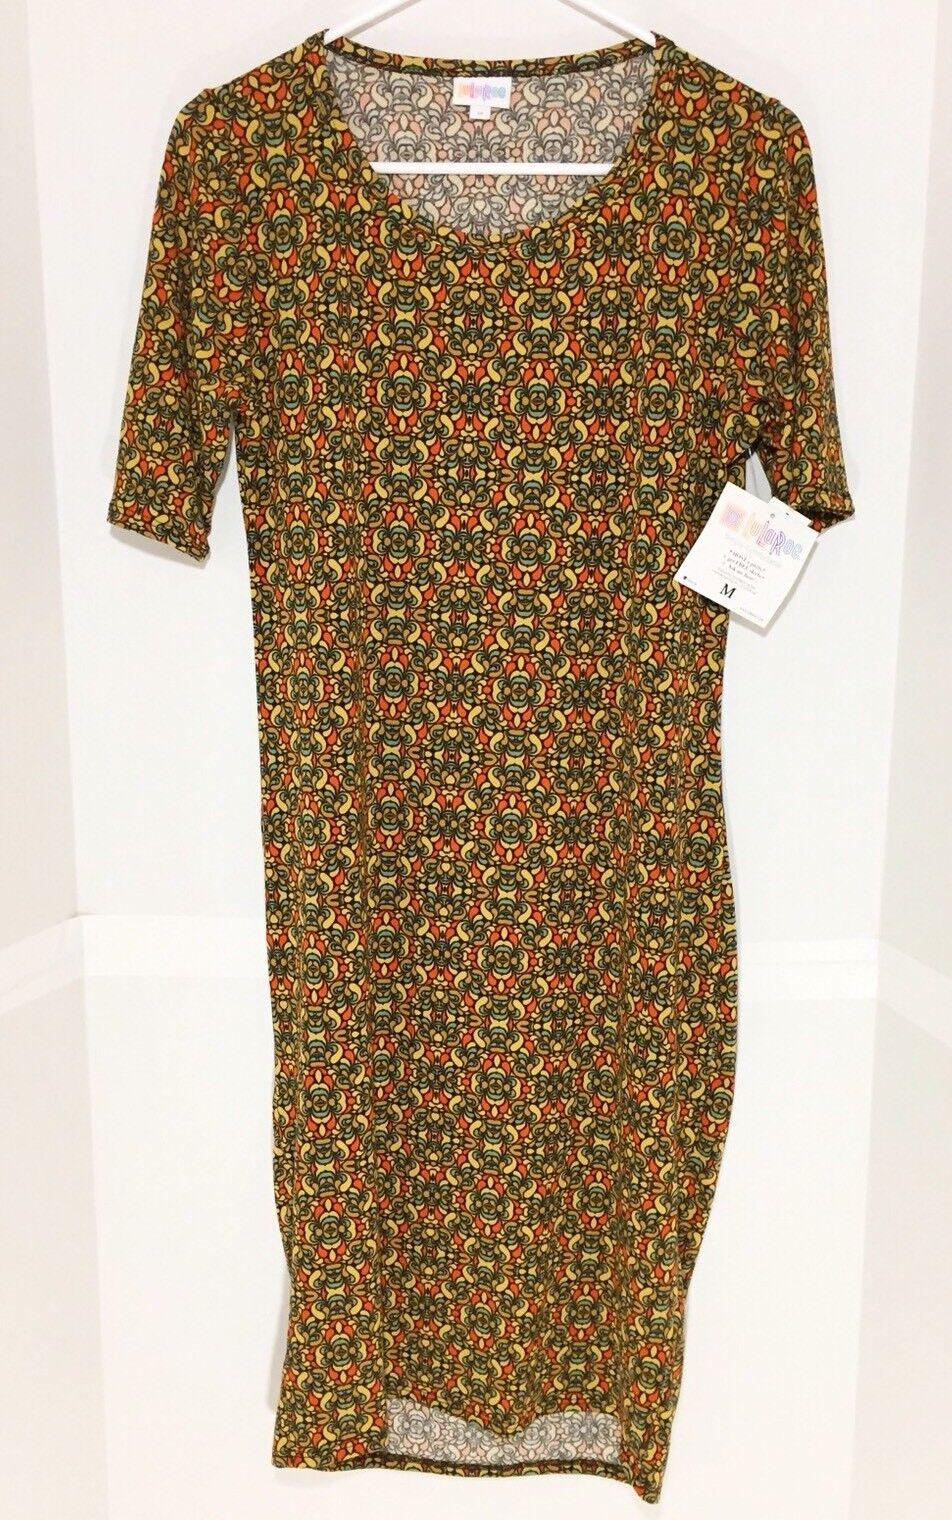 LuLaRoe Julia Dress Medium Floral schwarz Orange Gold Teal